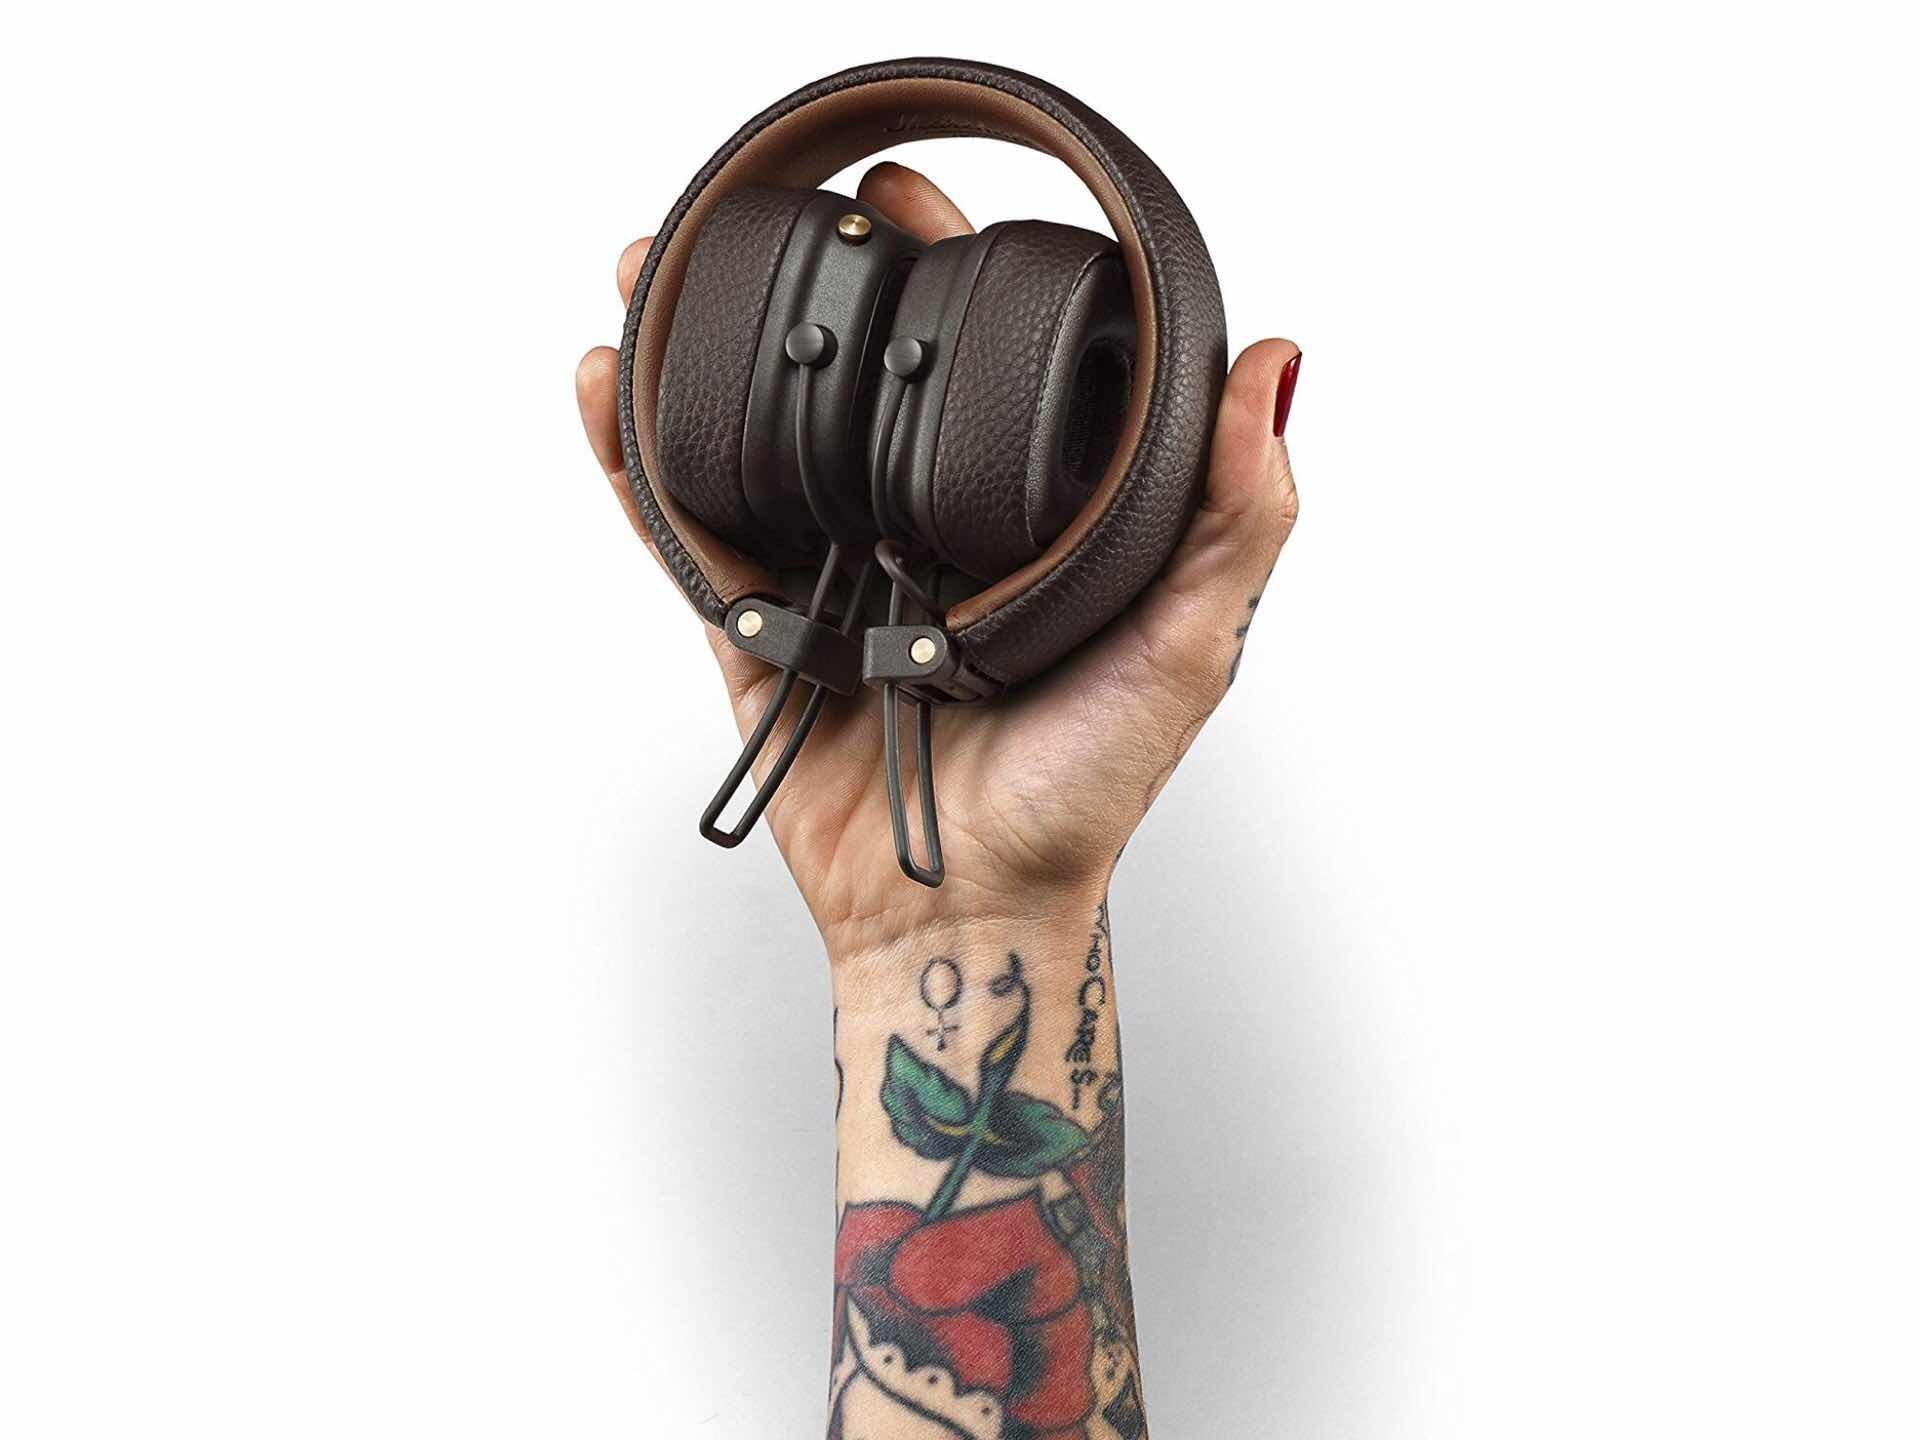 marshall-major-iii-wireless-on-ear-headphones-2